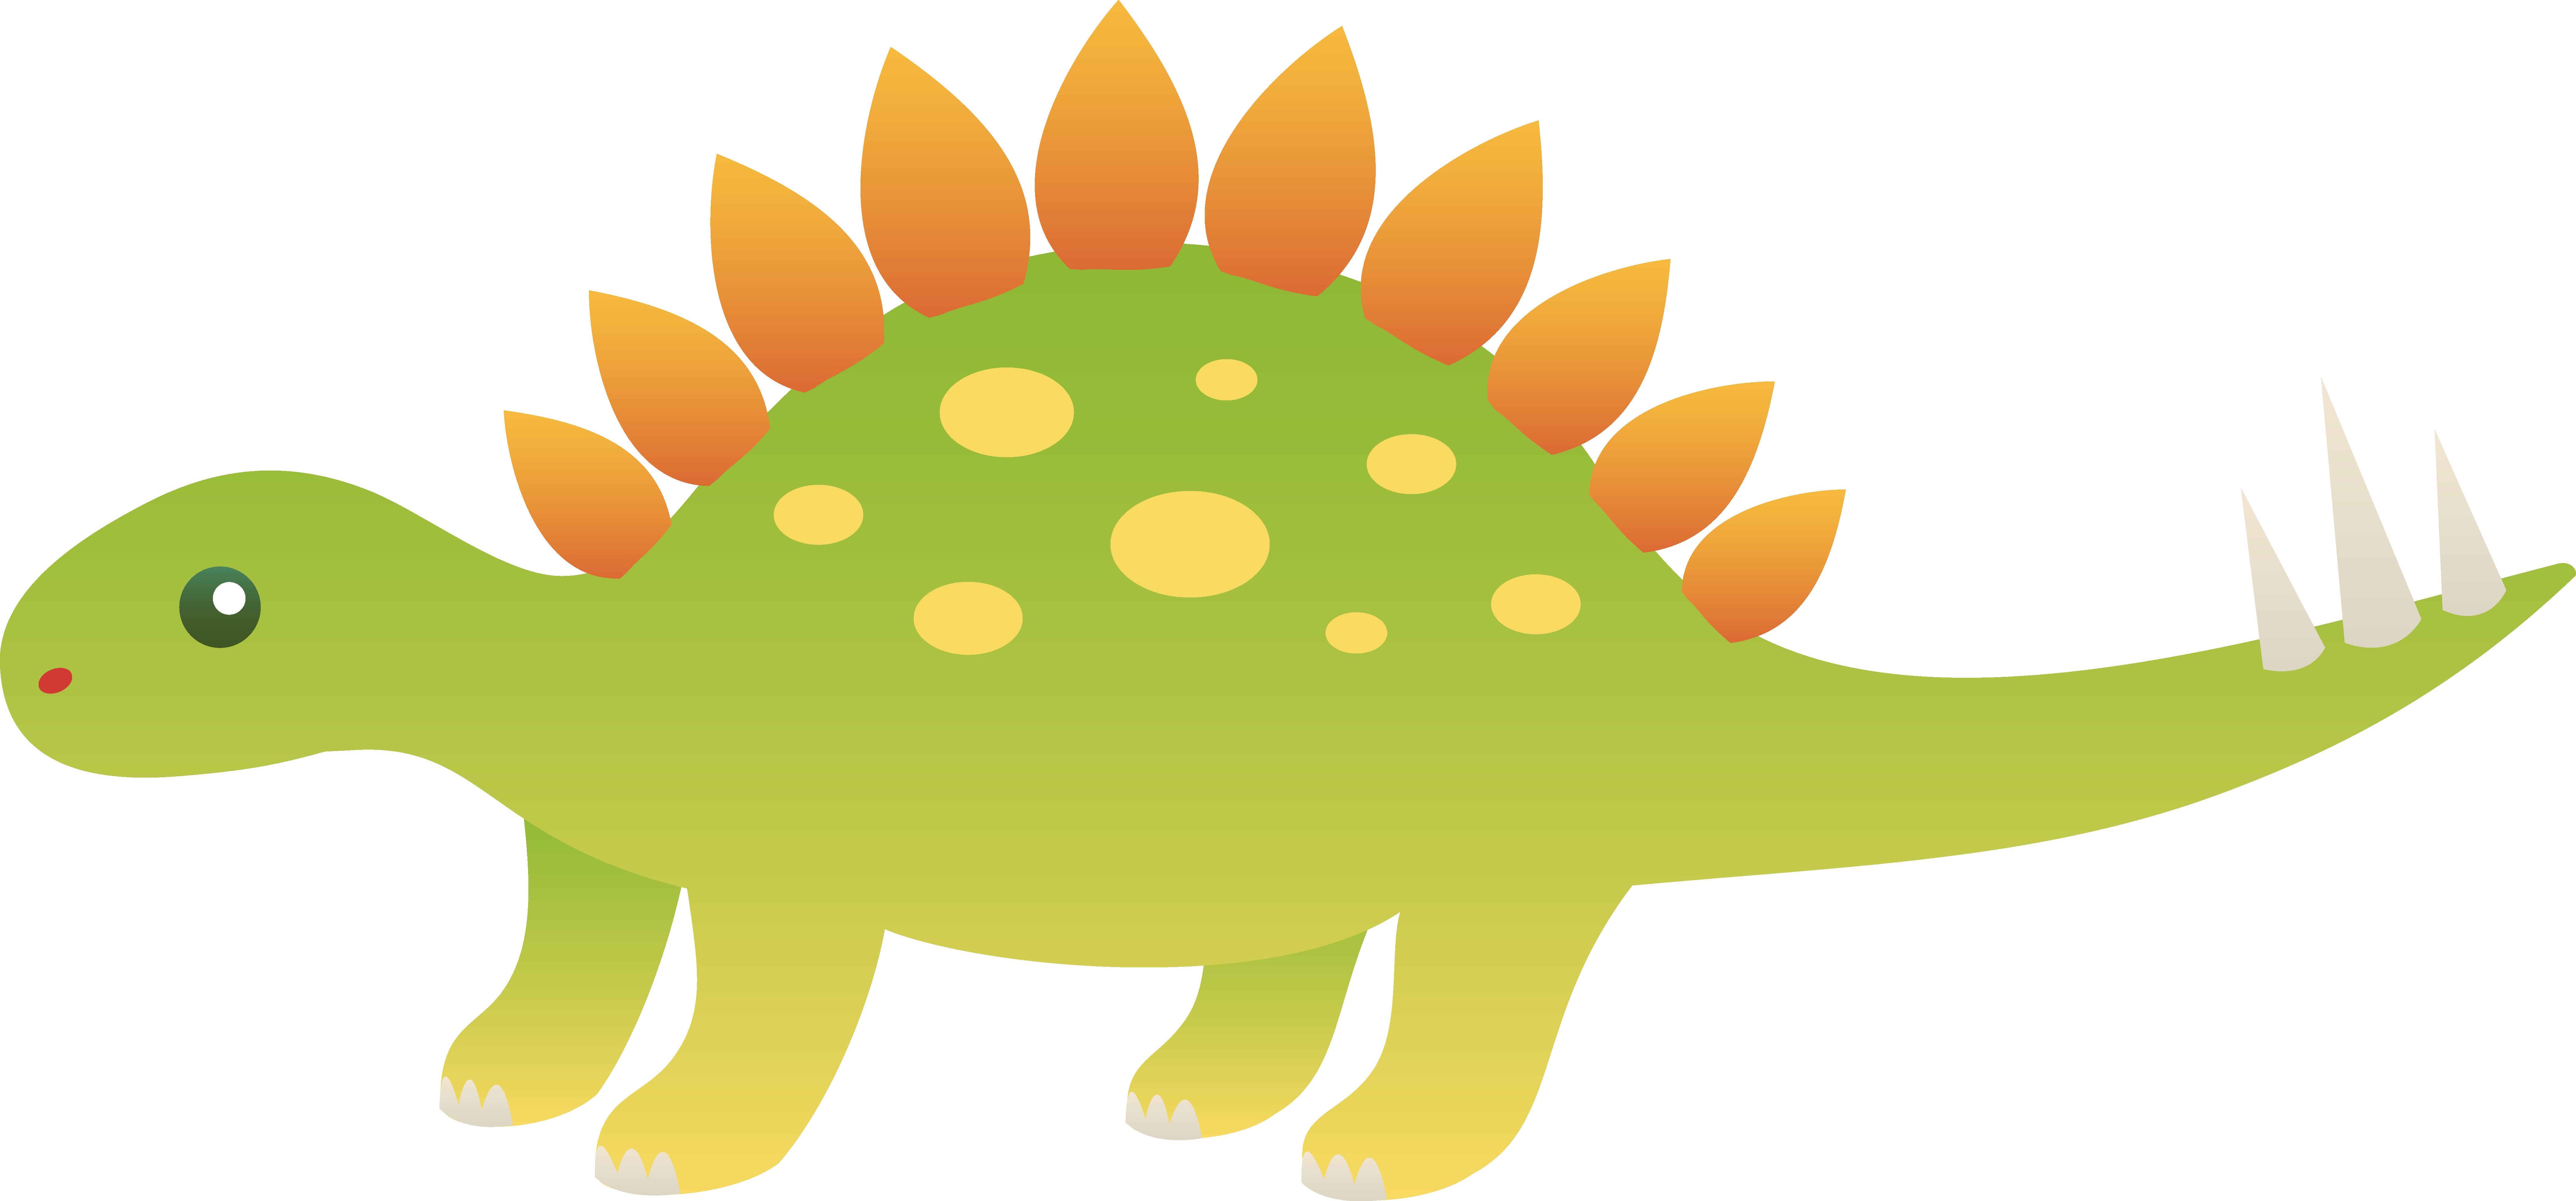 Stegosaurus clipart cute Com Image free dinosaur PNG